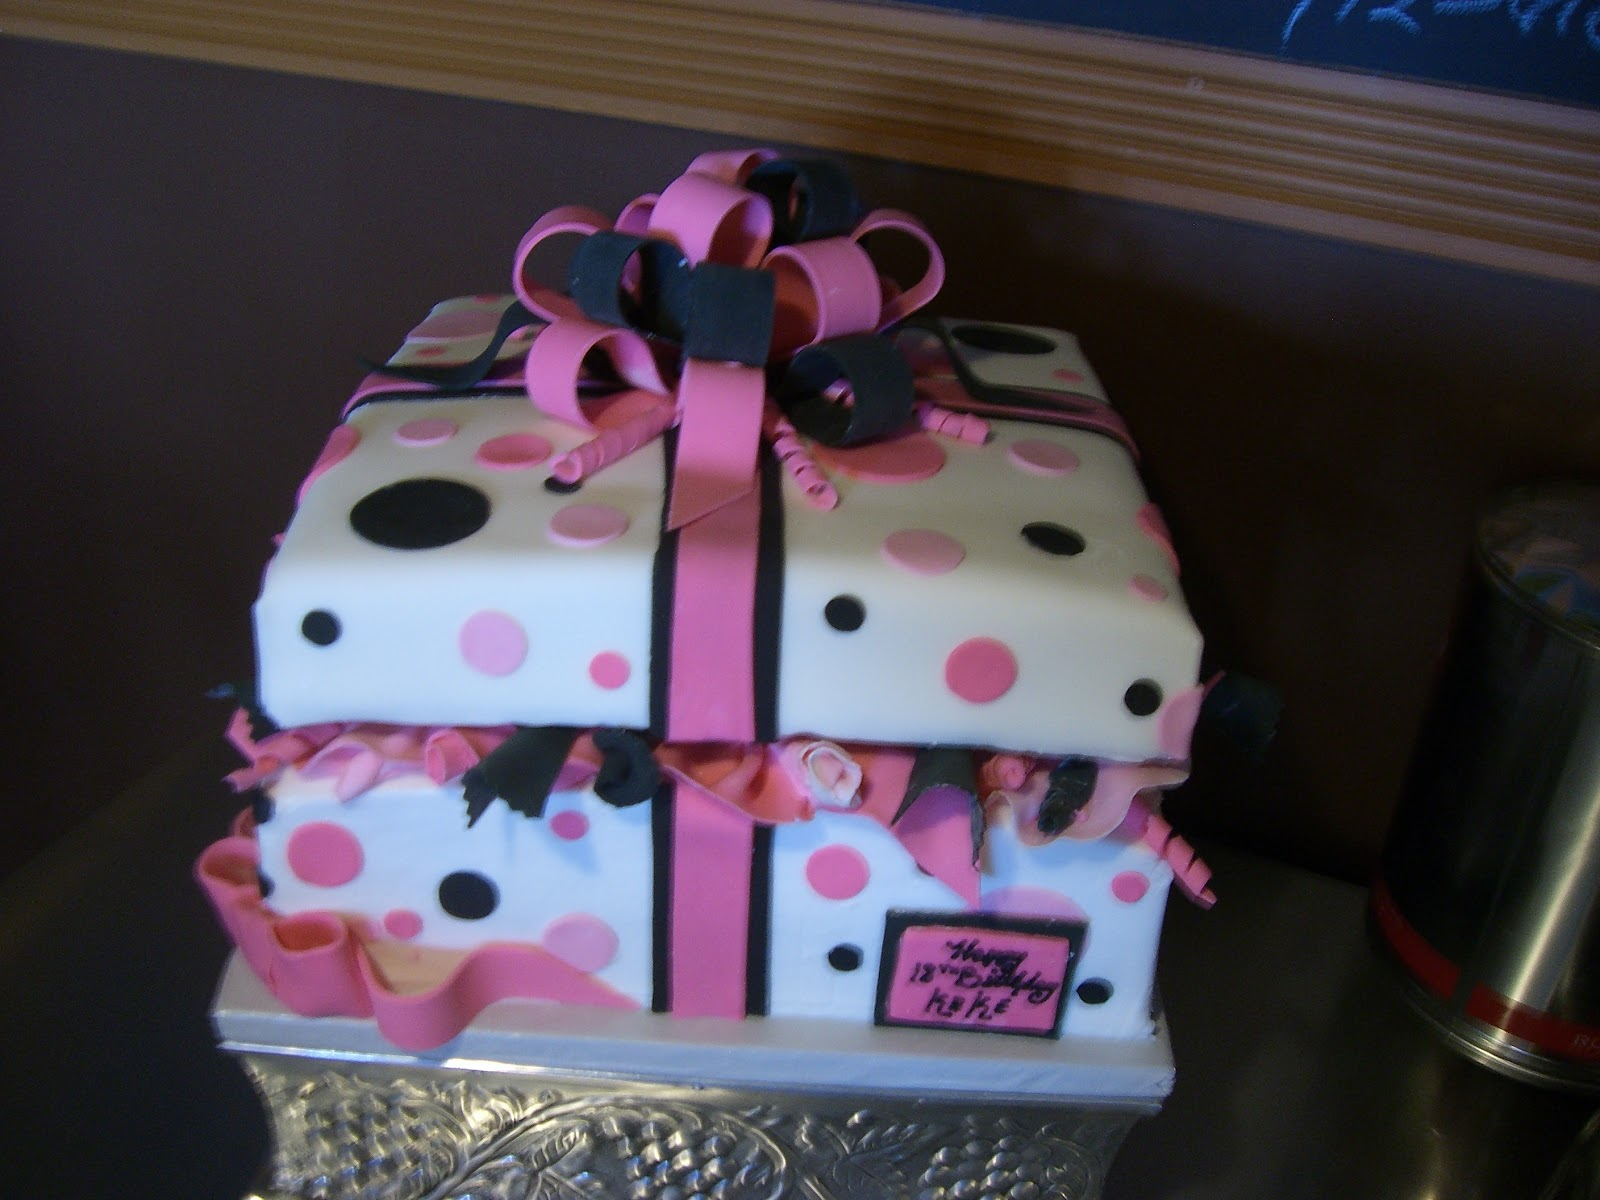 Cake Art Lawrenceville Hwy : CAFE AROMAS: Sweet 16 Present Cake